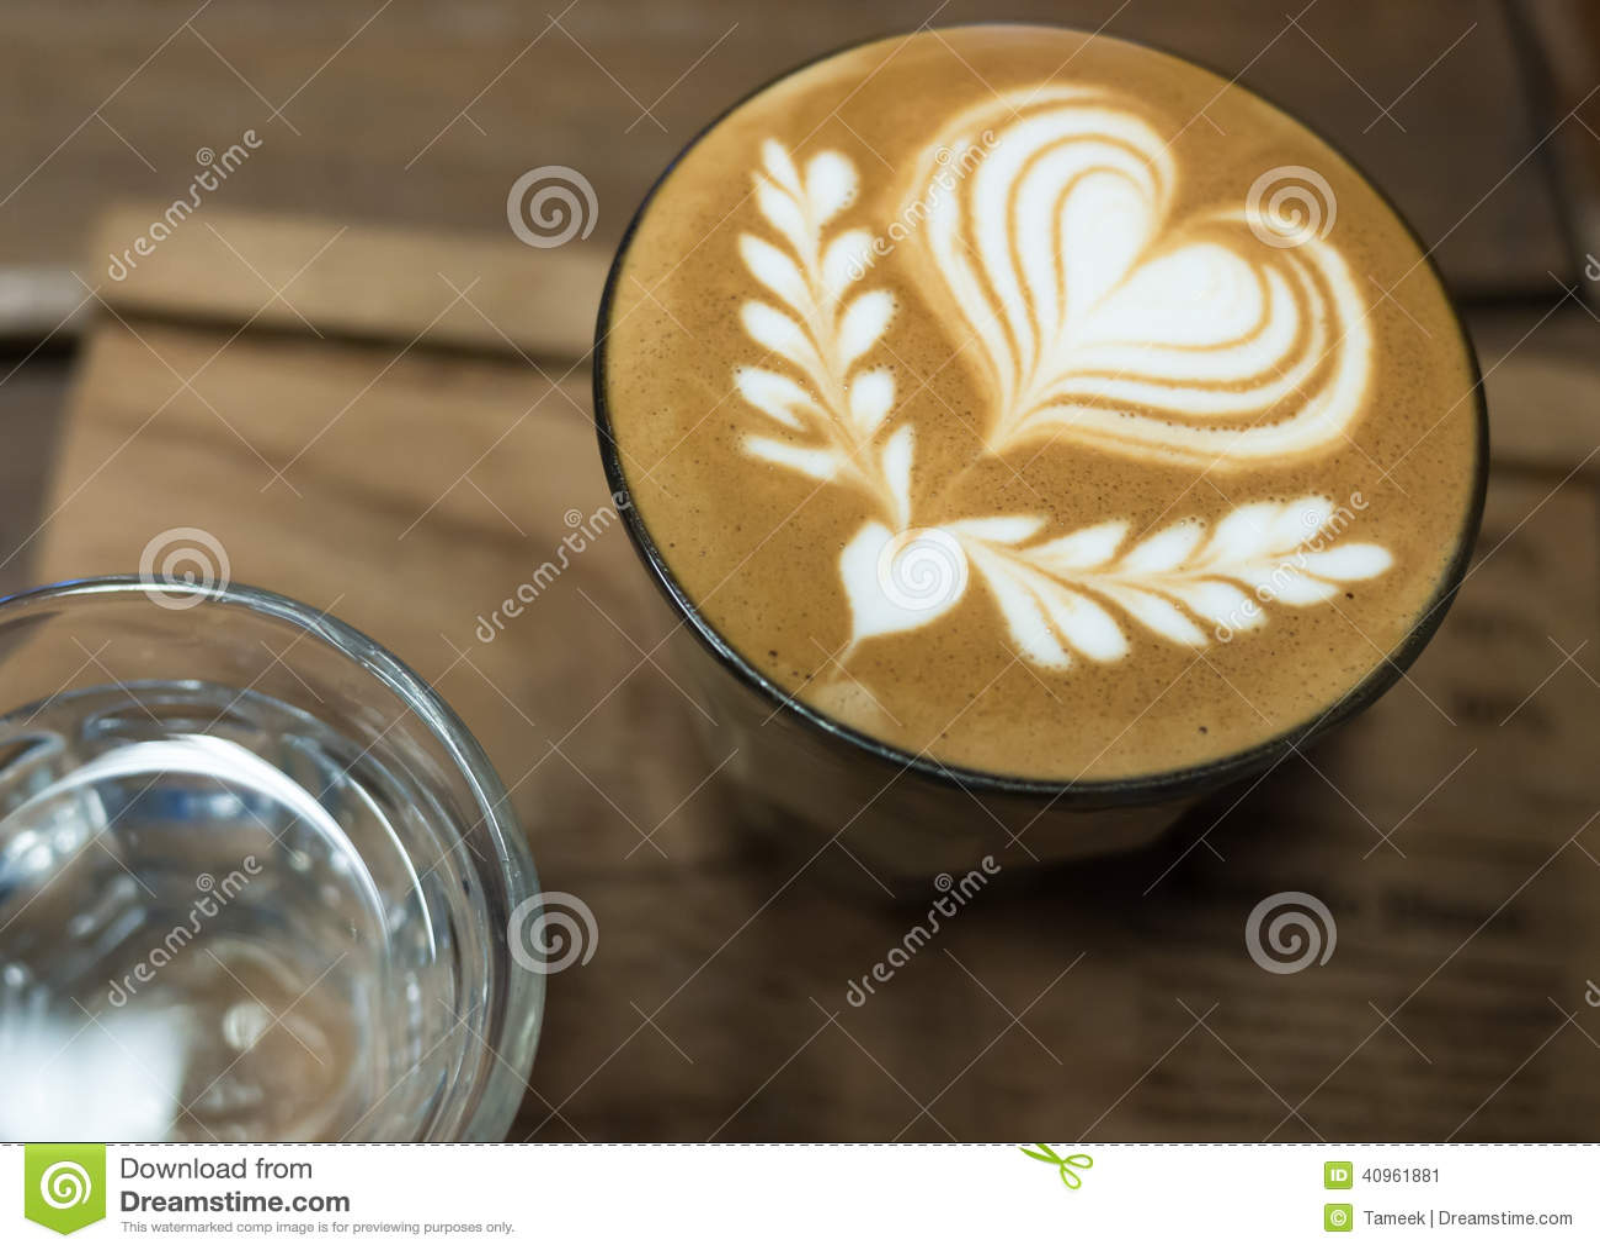 Arte del latte del café